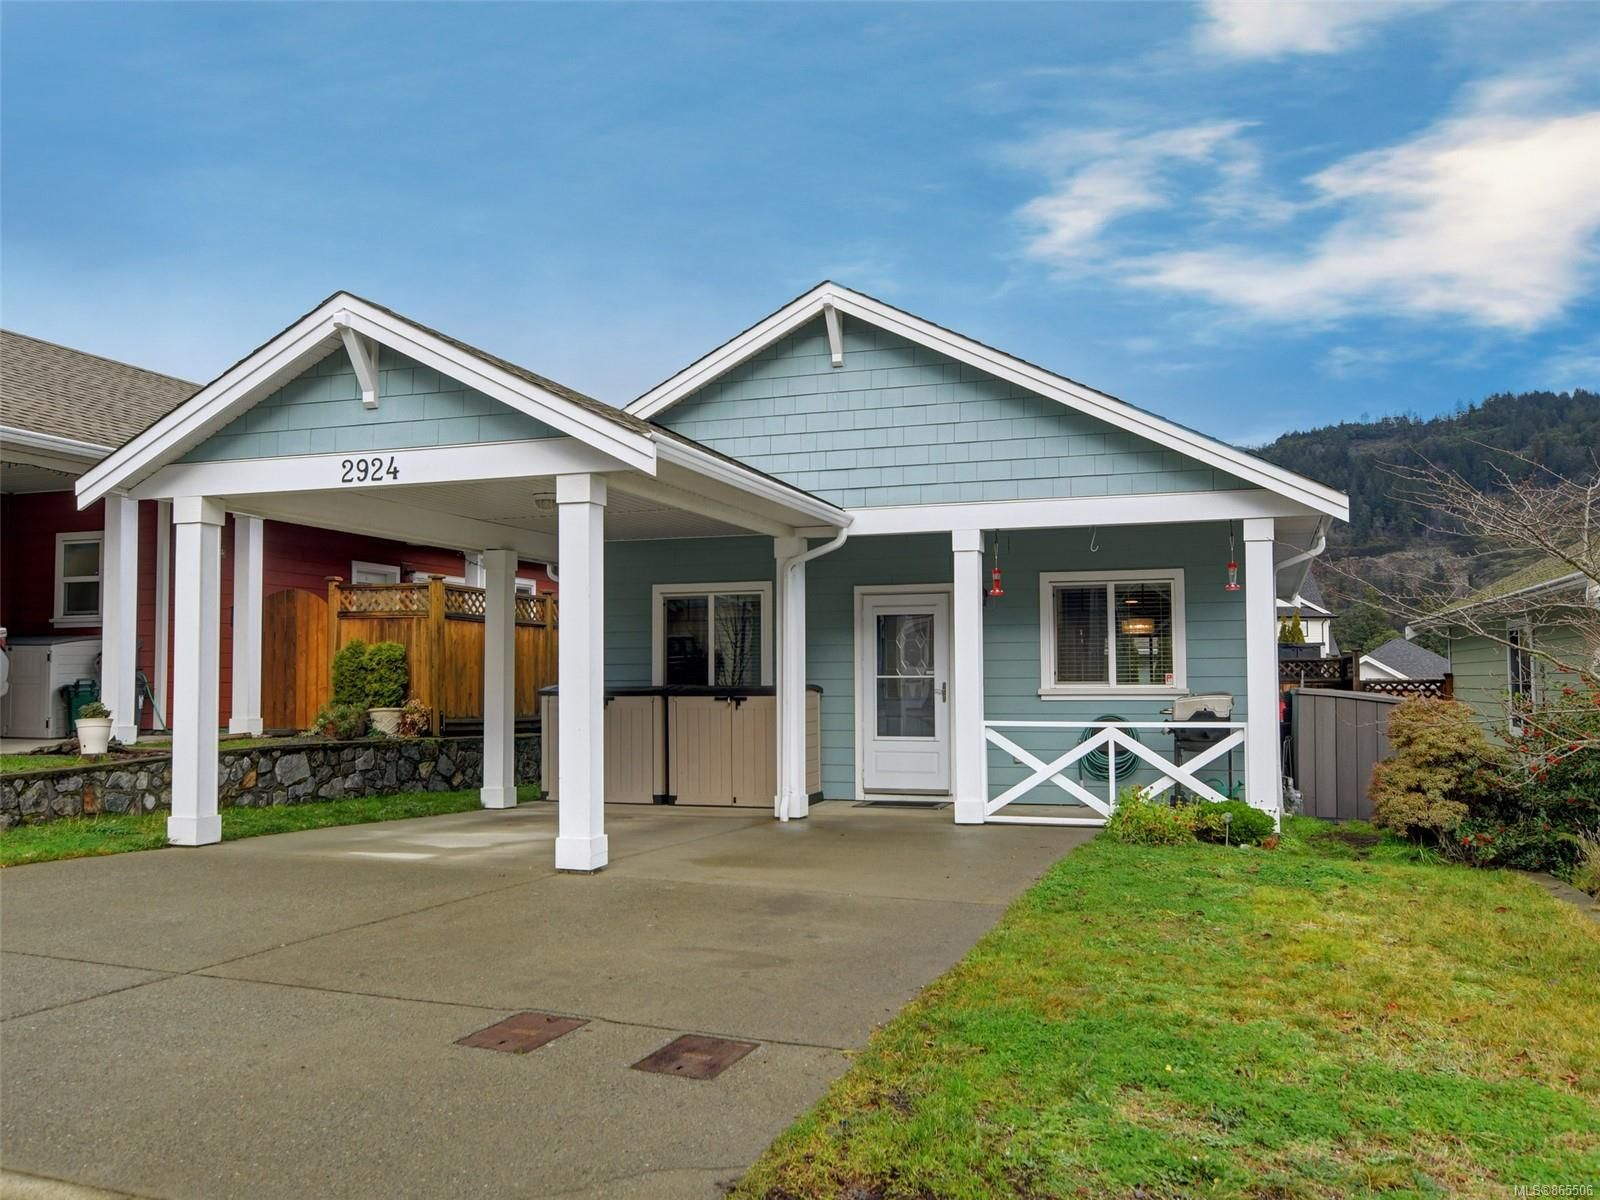 Main Photo: 2924 Trestle Pl in : La Langford Lake House for sale (Langford)  : MLS®# 865506